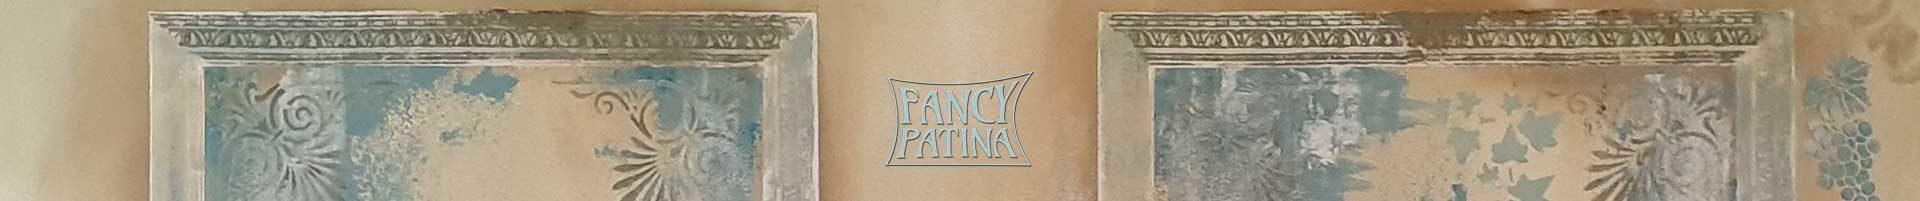 Fancy Patina - THE WALL